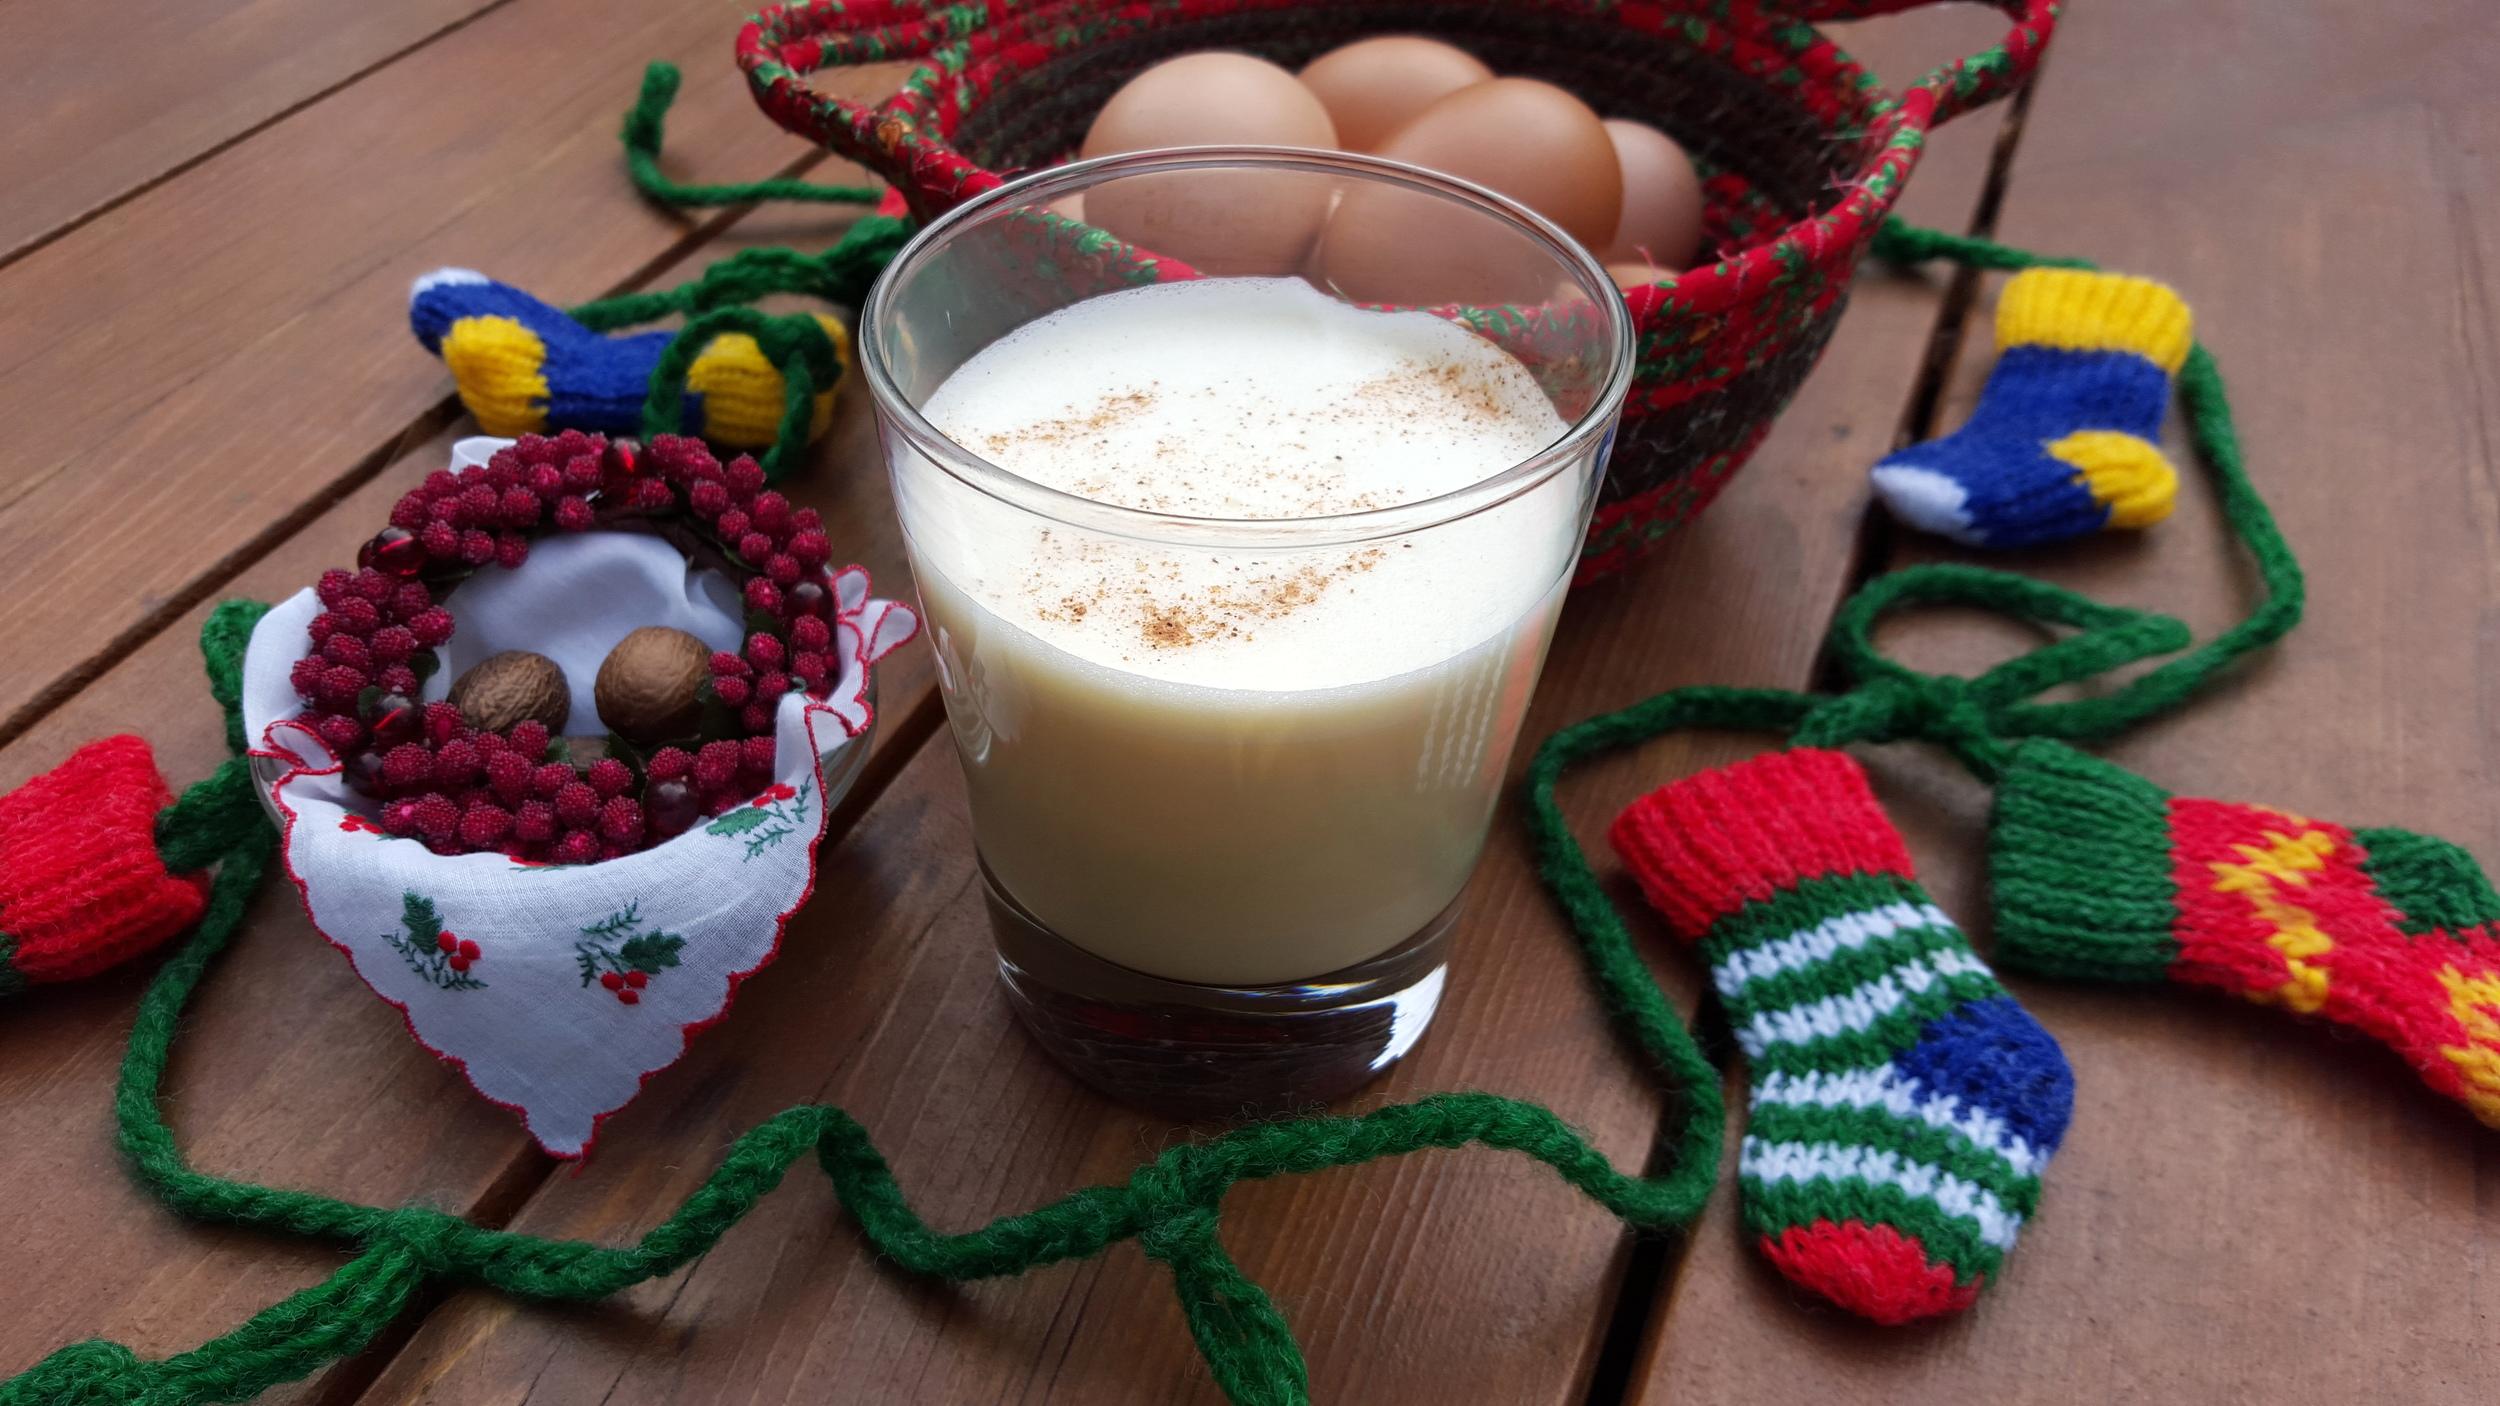 Simple ingredients - eggs, dairy, sugar and a hit of nutmeg